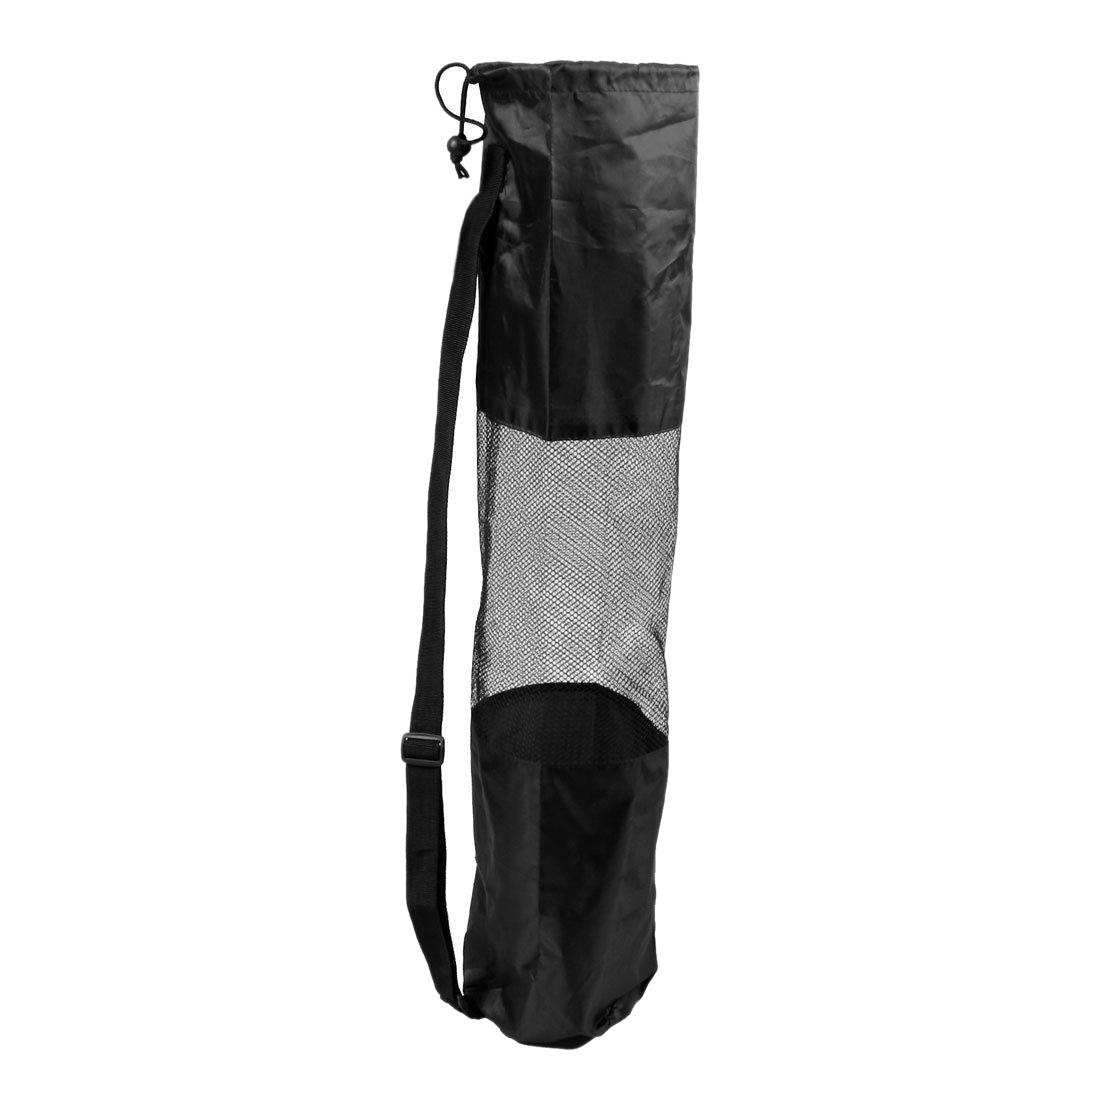 Portable Lightweight Exercise Yoga Mat Bag Carrier Mesh